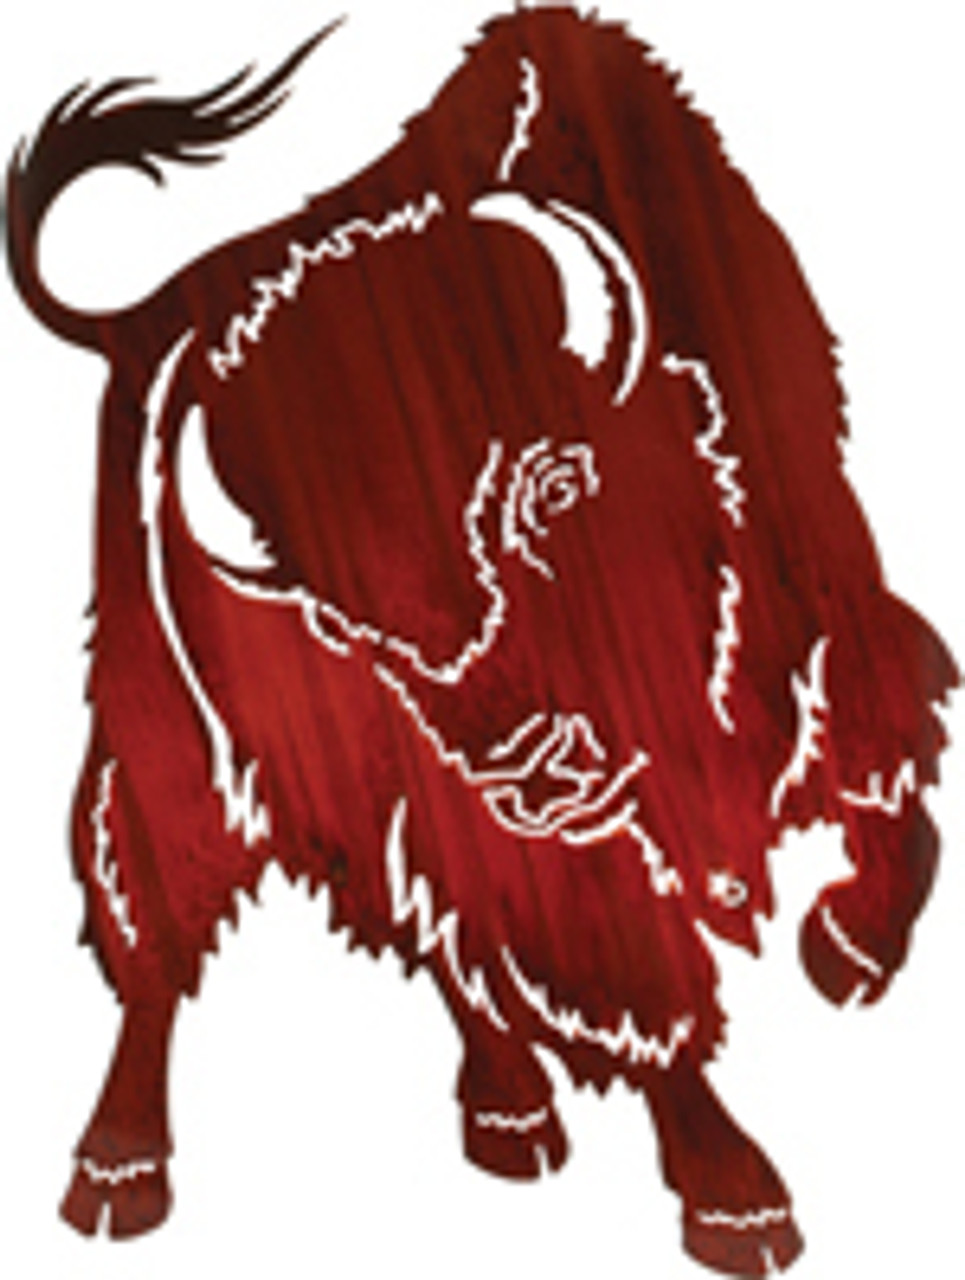 Buffalo Wall Art,Wall Hangings of Buffalo